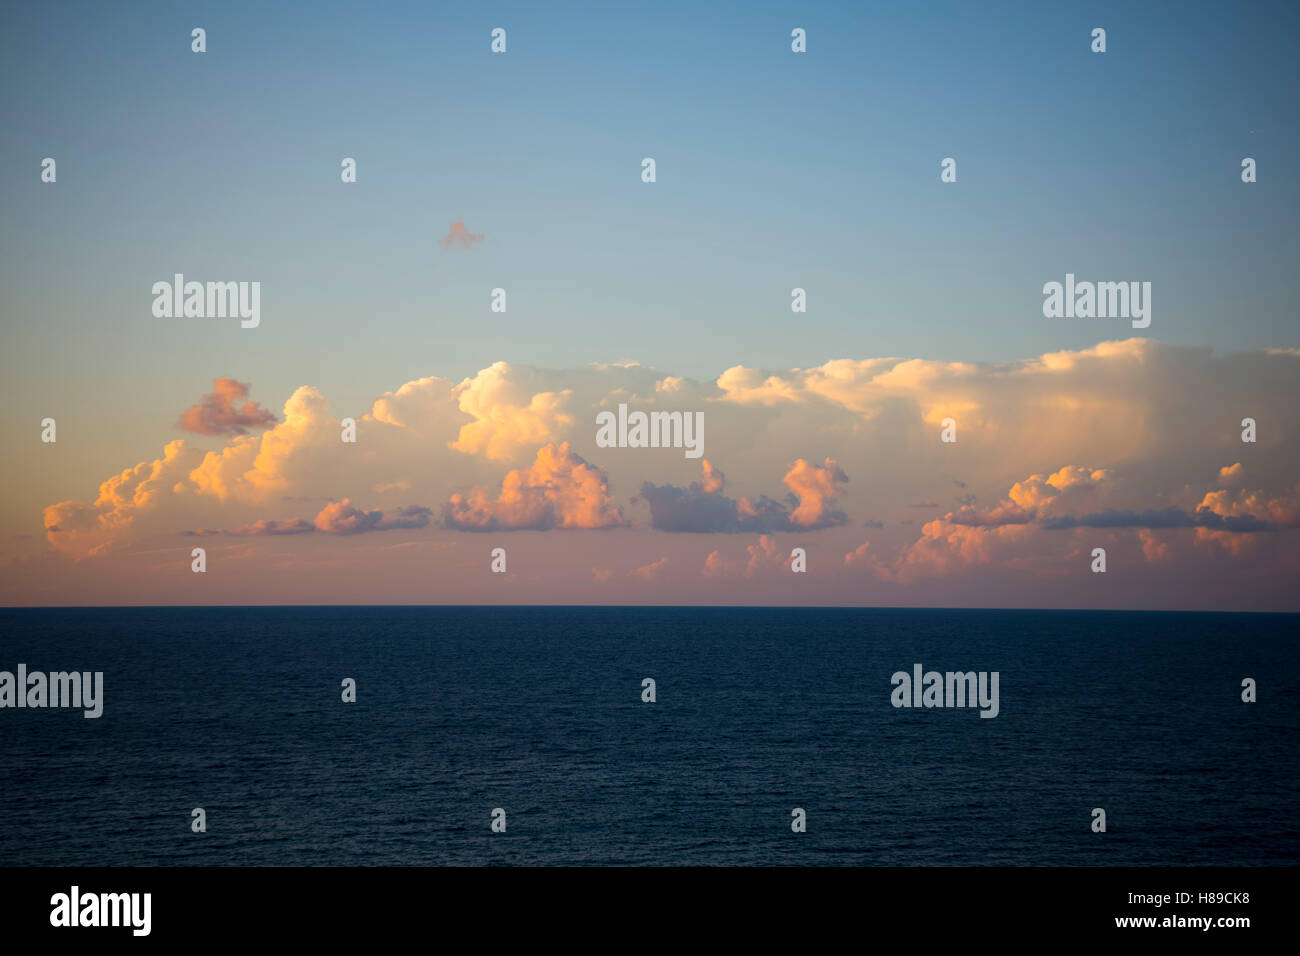 Griechenland, Kreta, Chania, abend wolken Stockbild